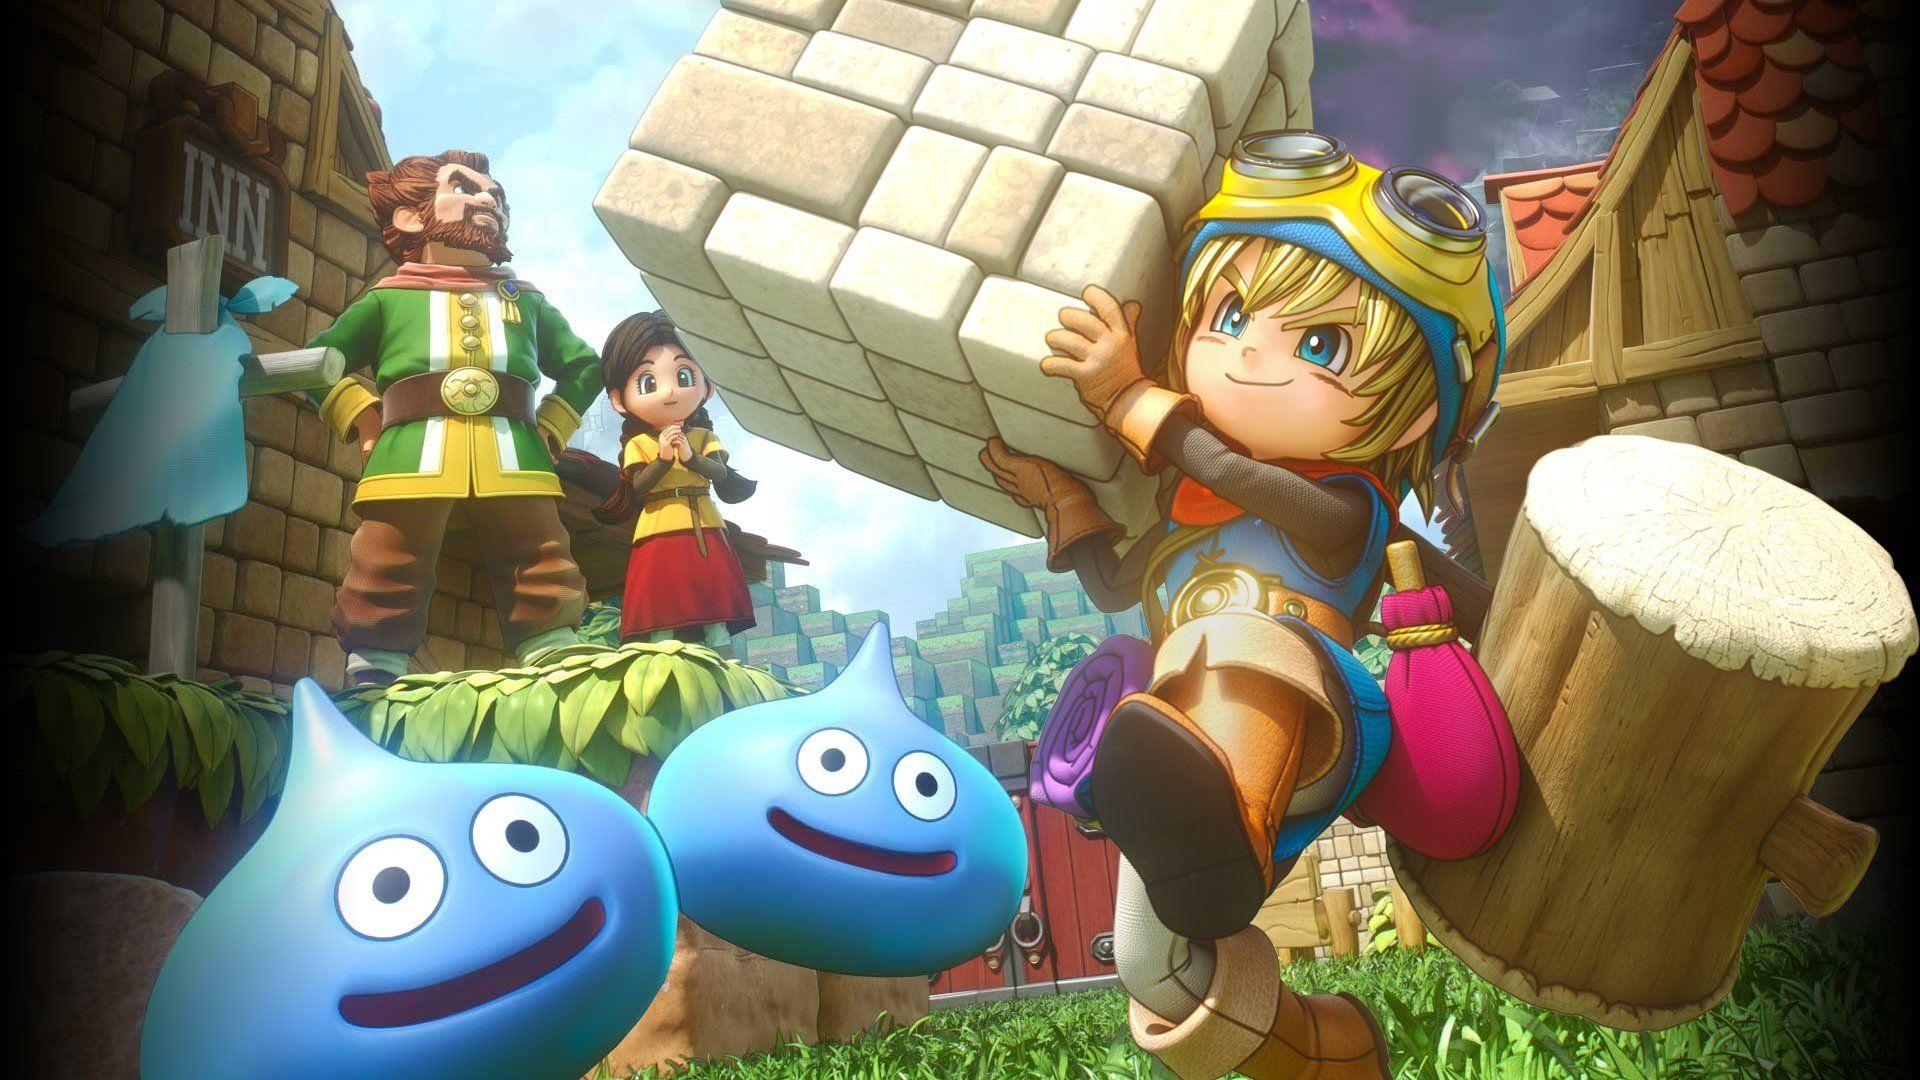 4 Dragon Quest Builders Hd Wallpapers Dragon Quest Builders